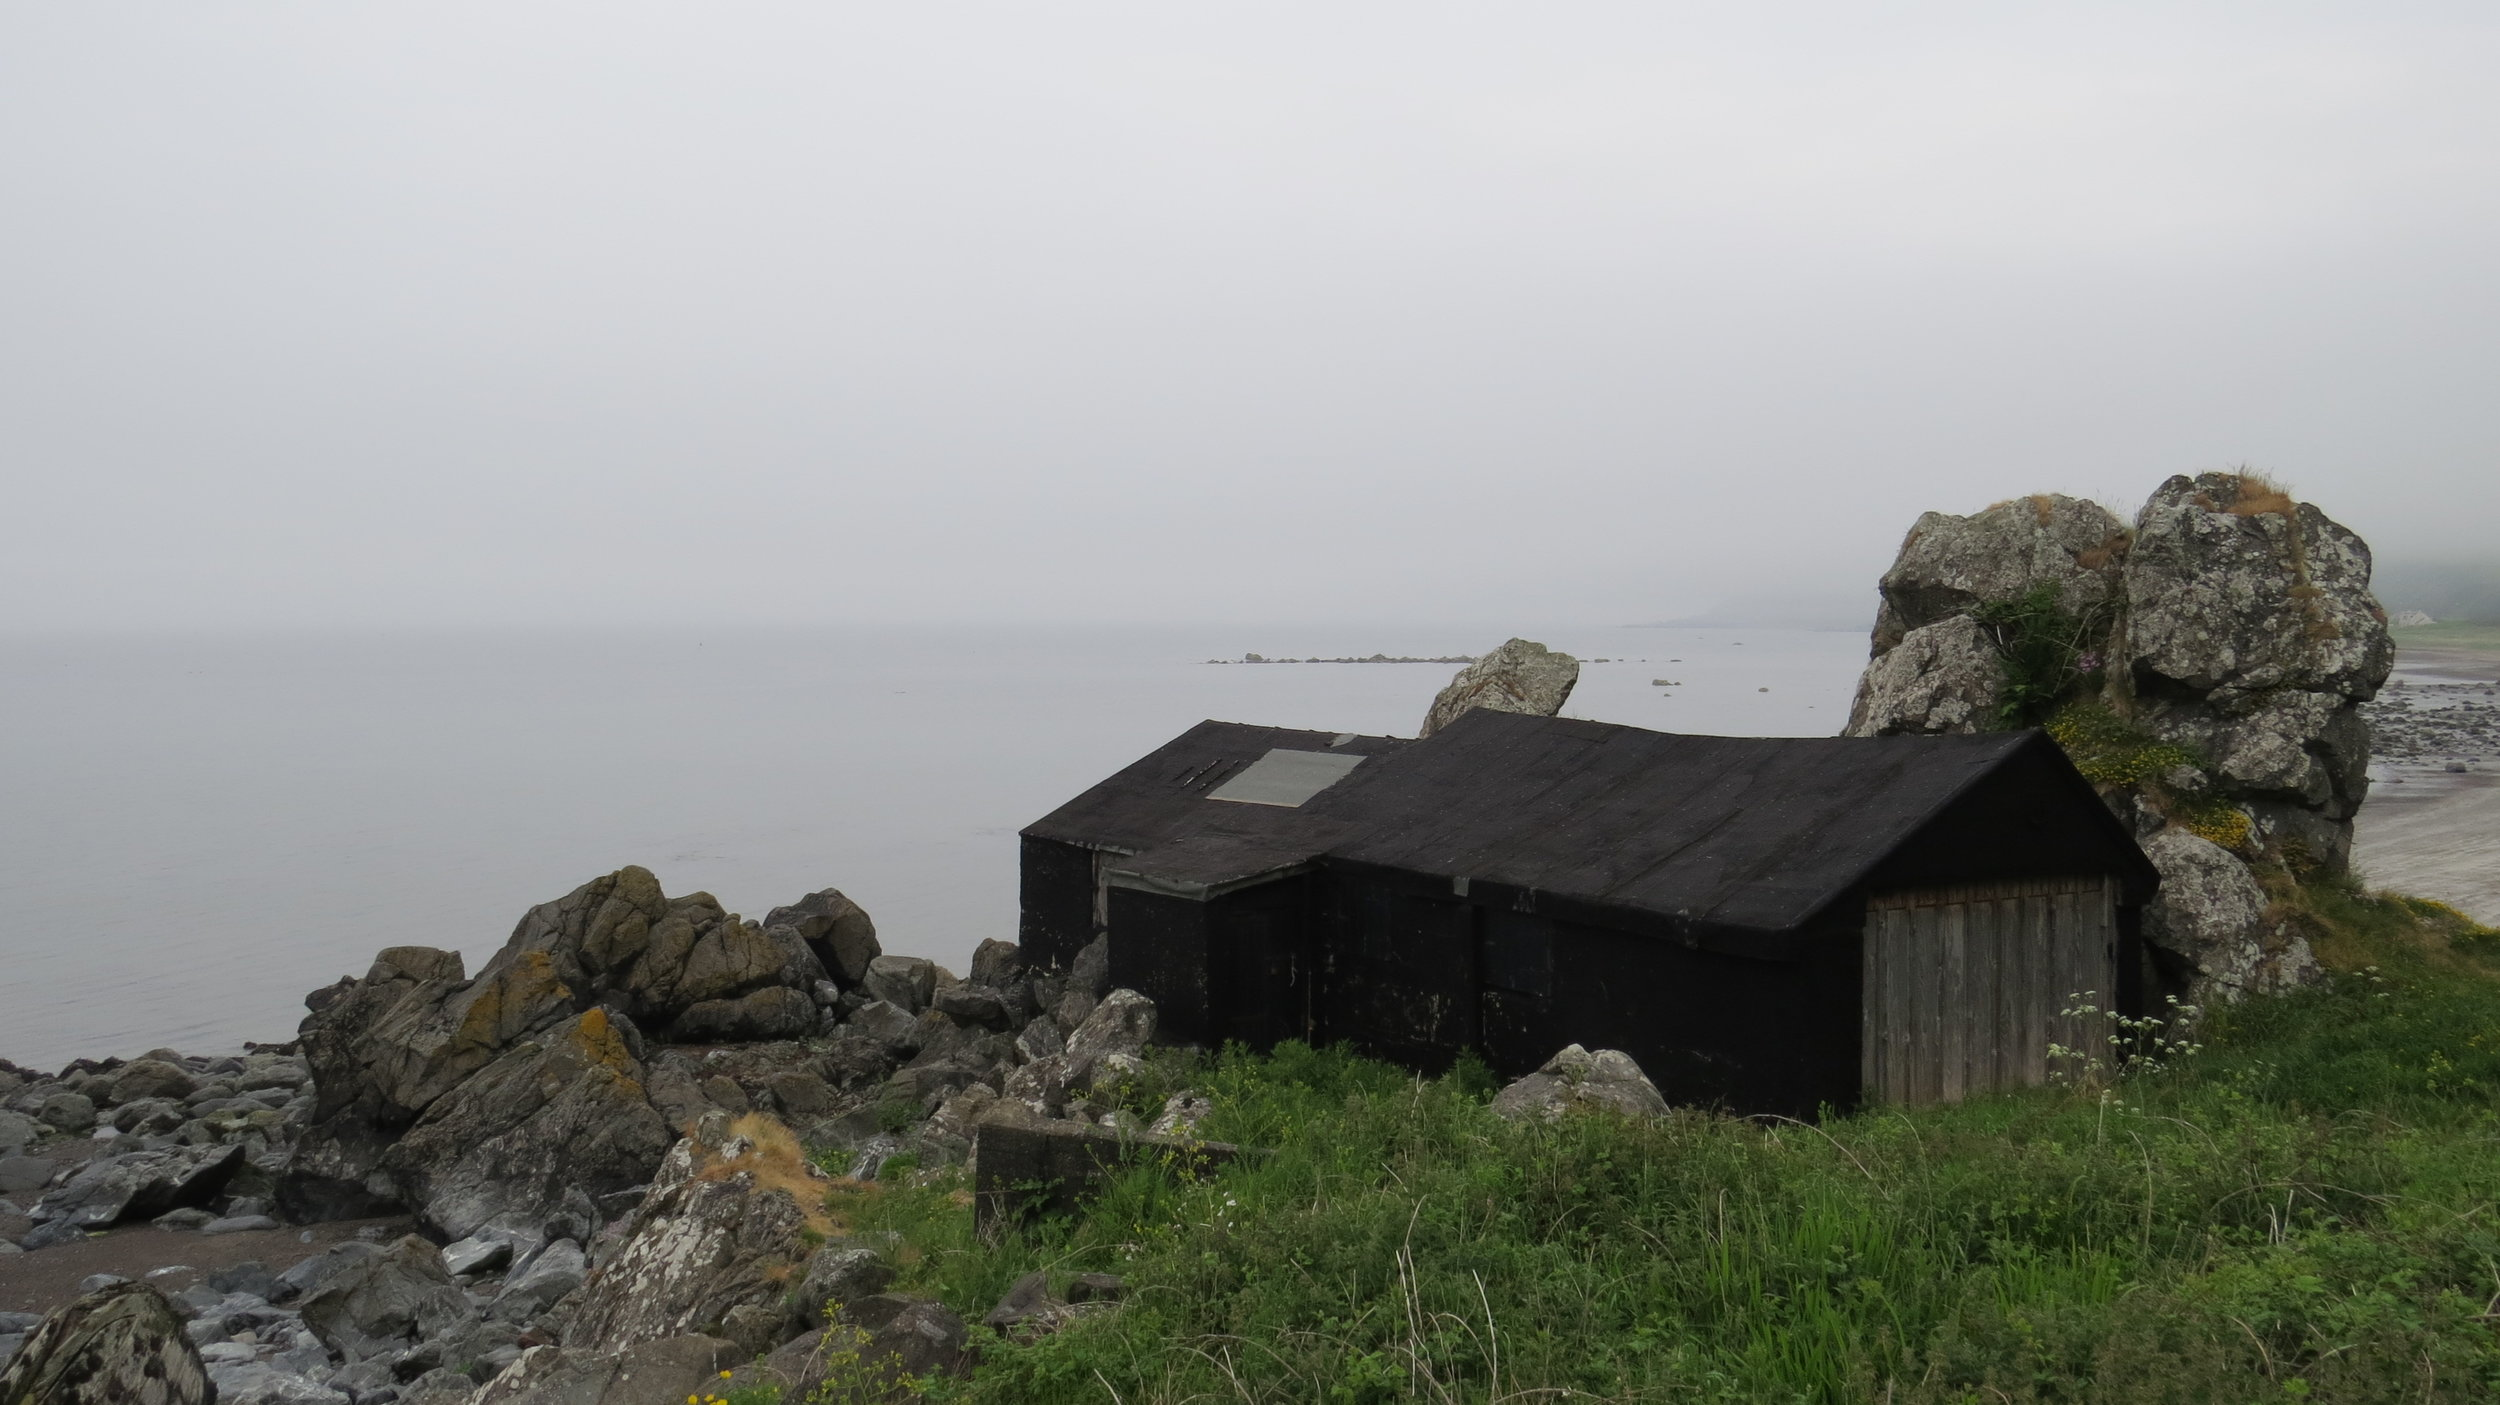 Interesting Hut